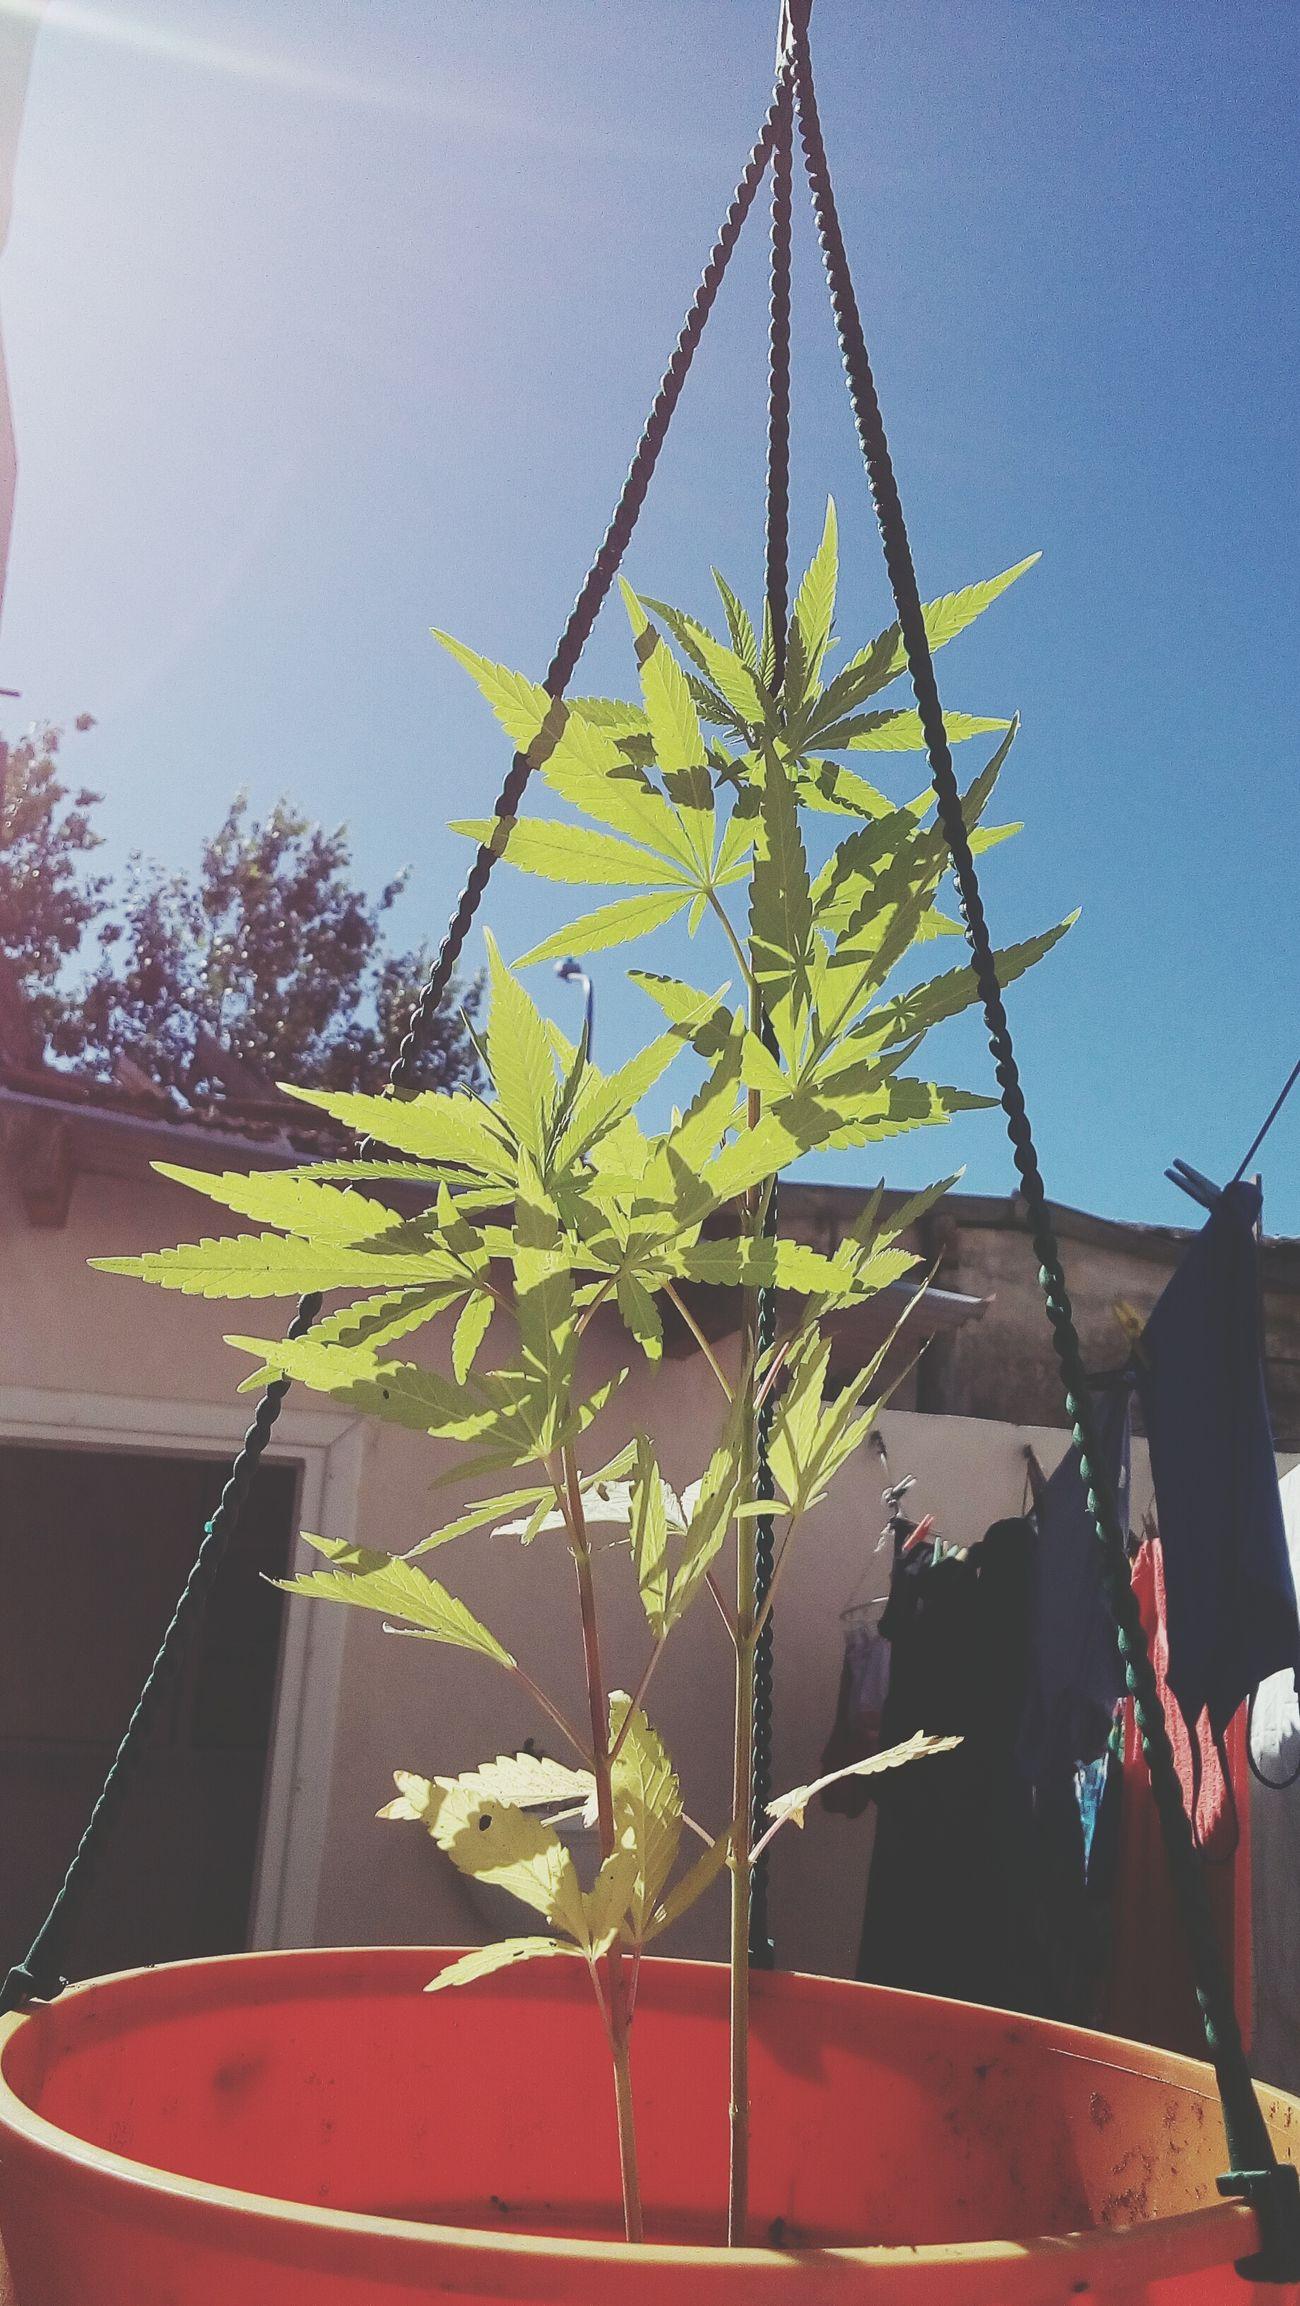 Thelmaandlouise Plants Weed Green Sky